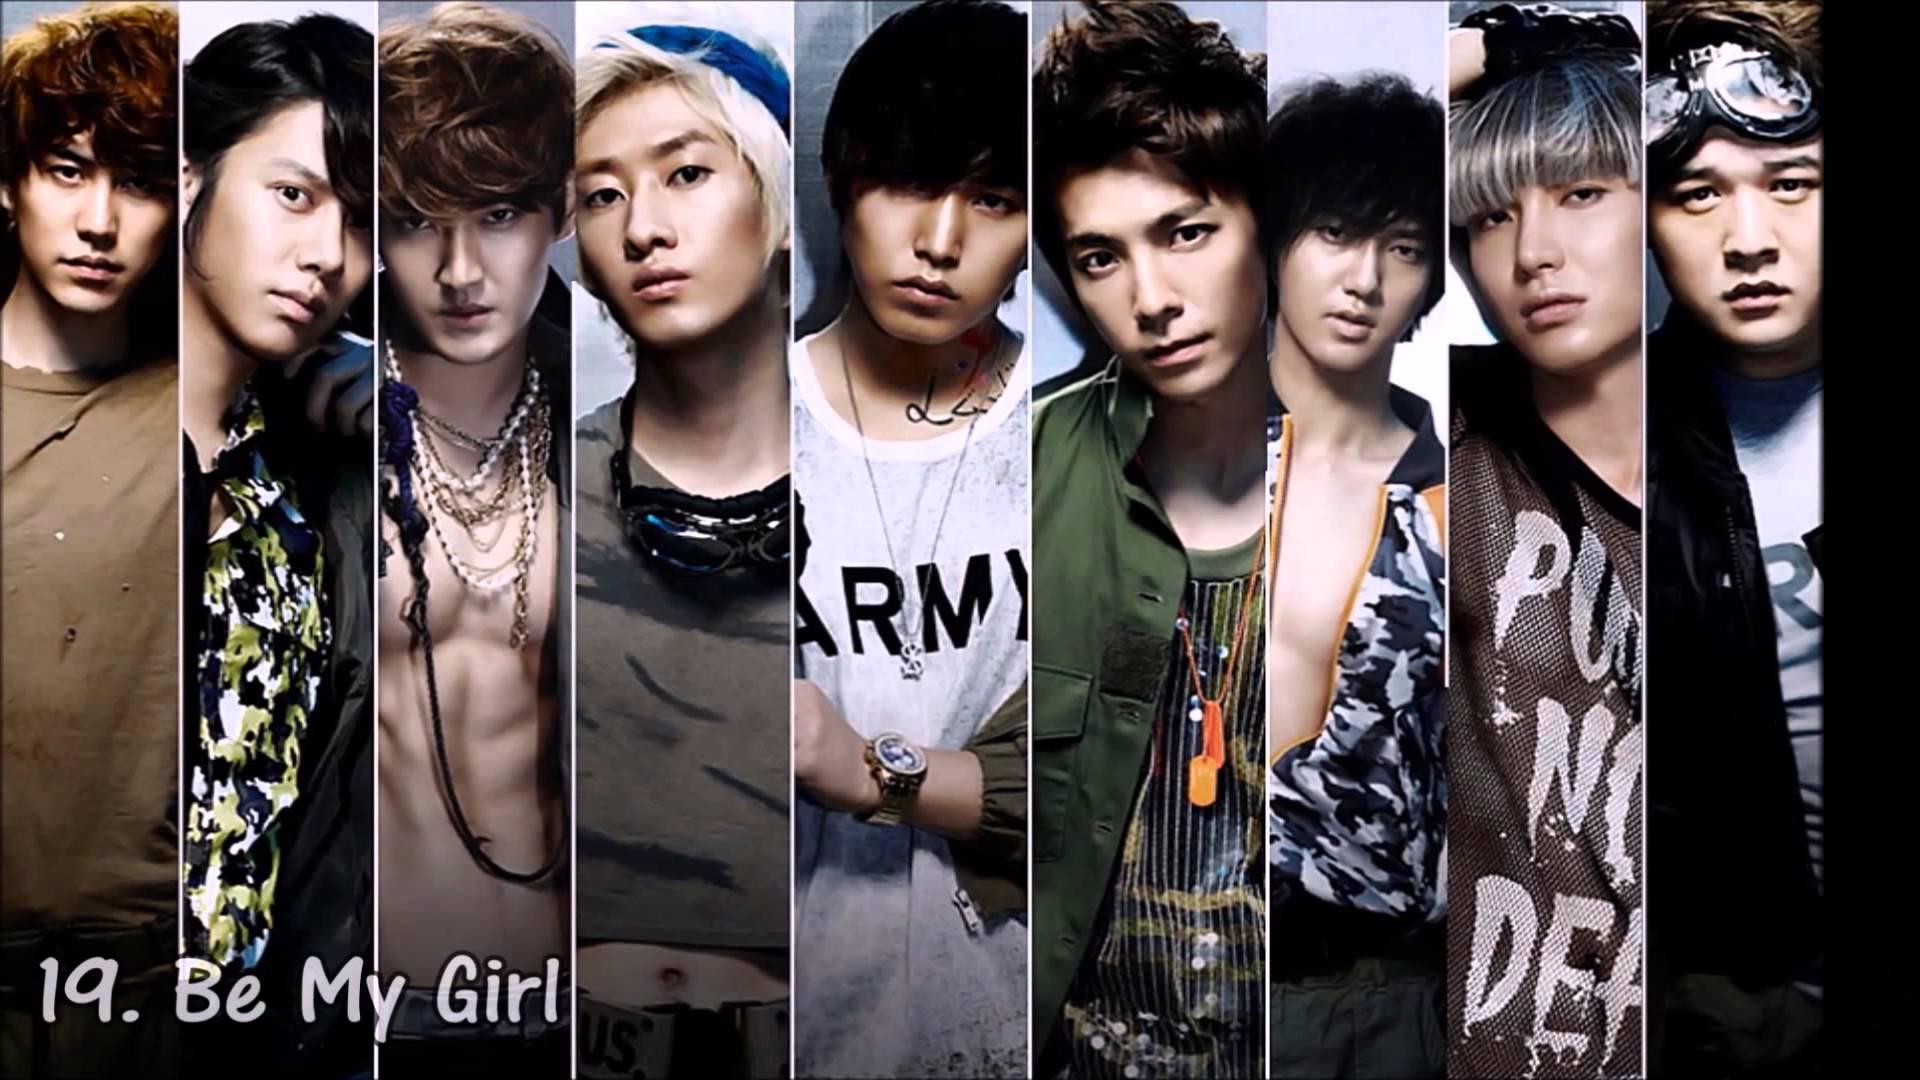 Super Junior HD wallpapers, Desktop wallpaper - most viewed